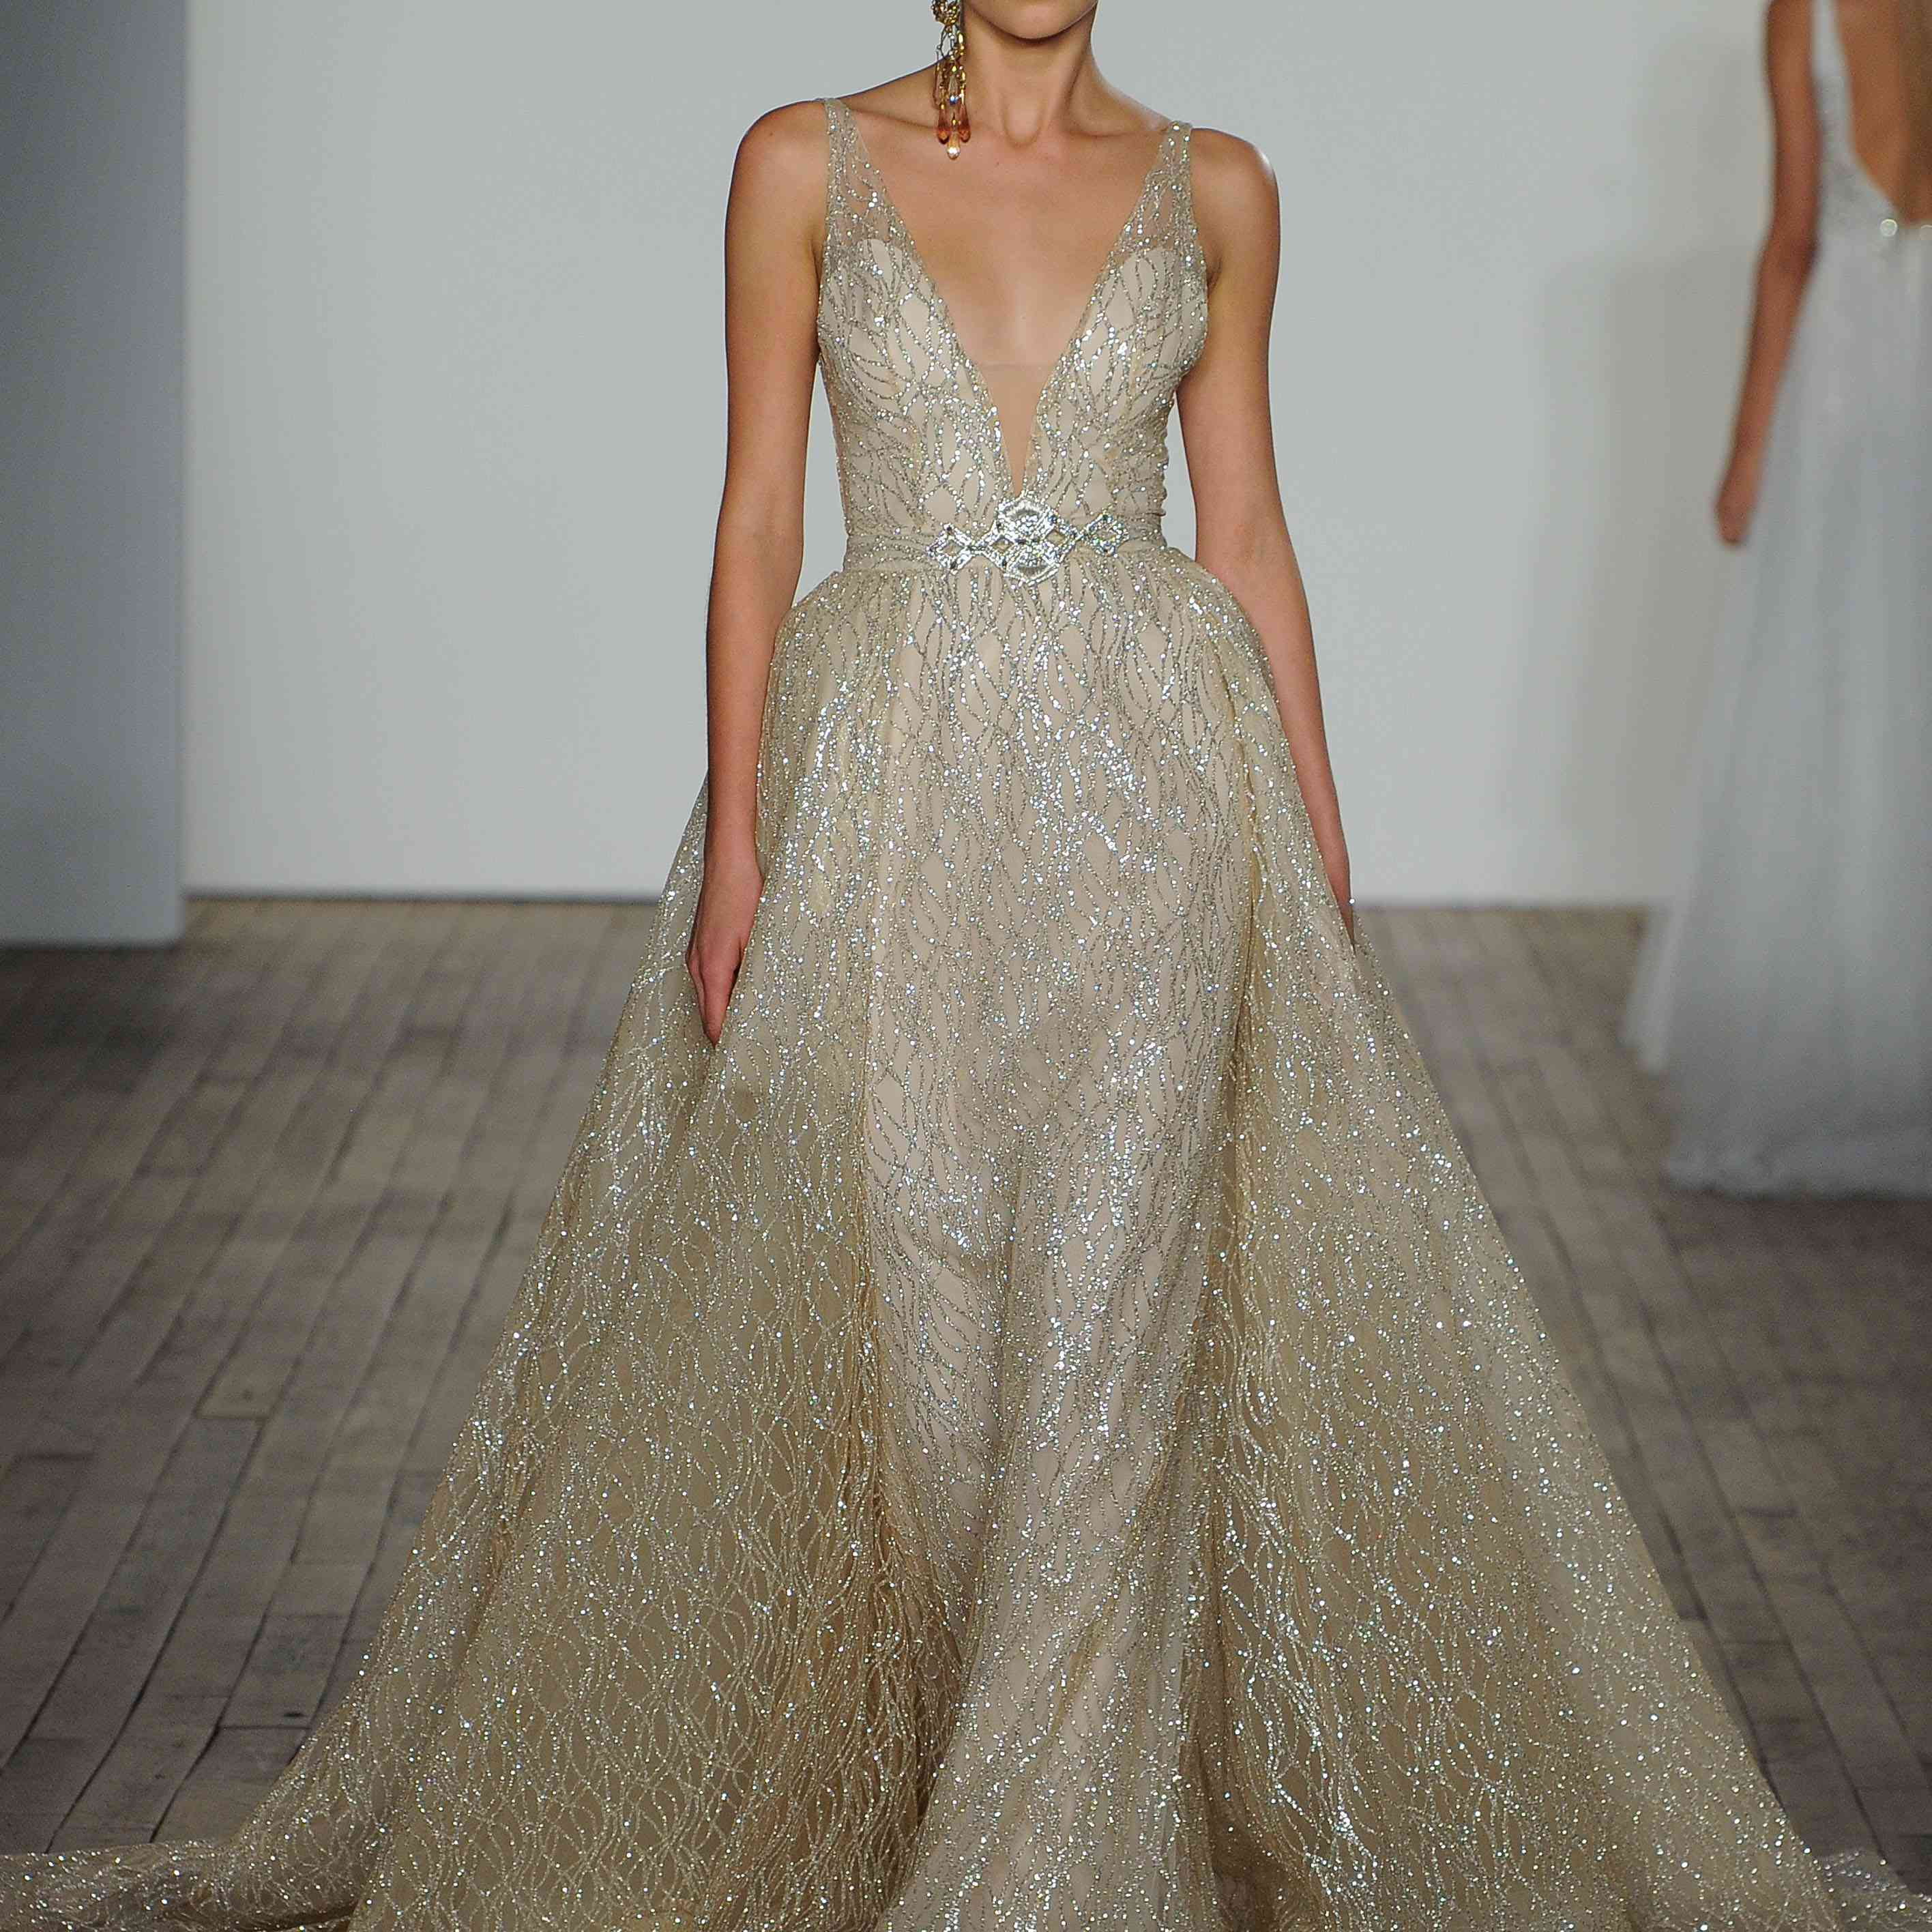 Aretha champagne plunging wedding dress by lazaro